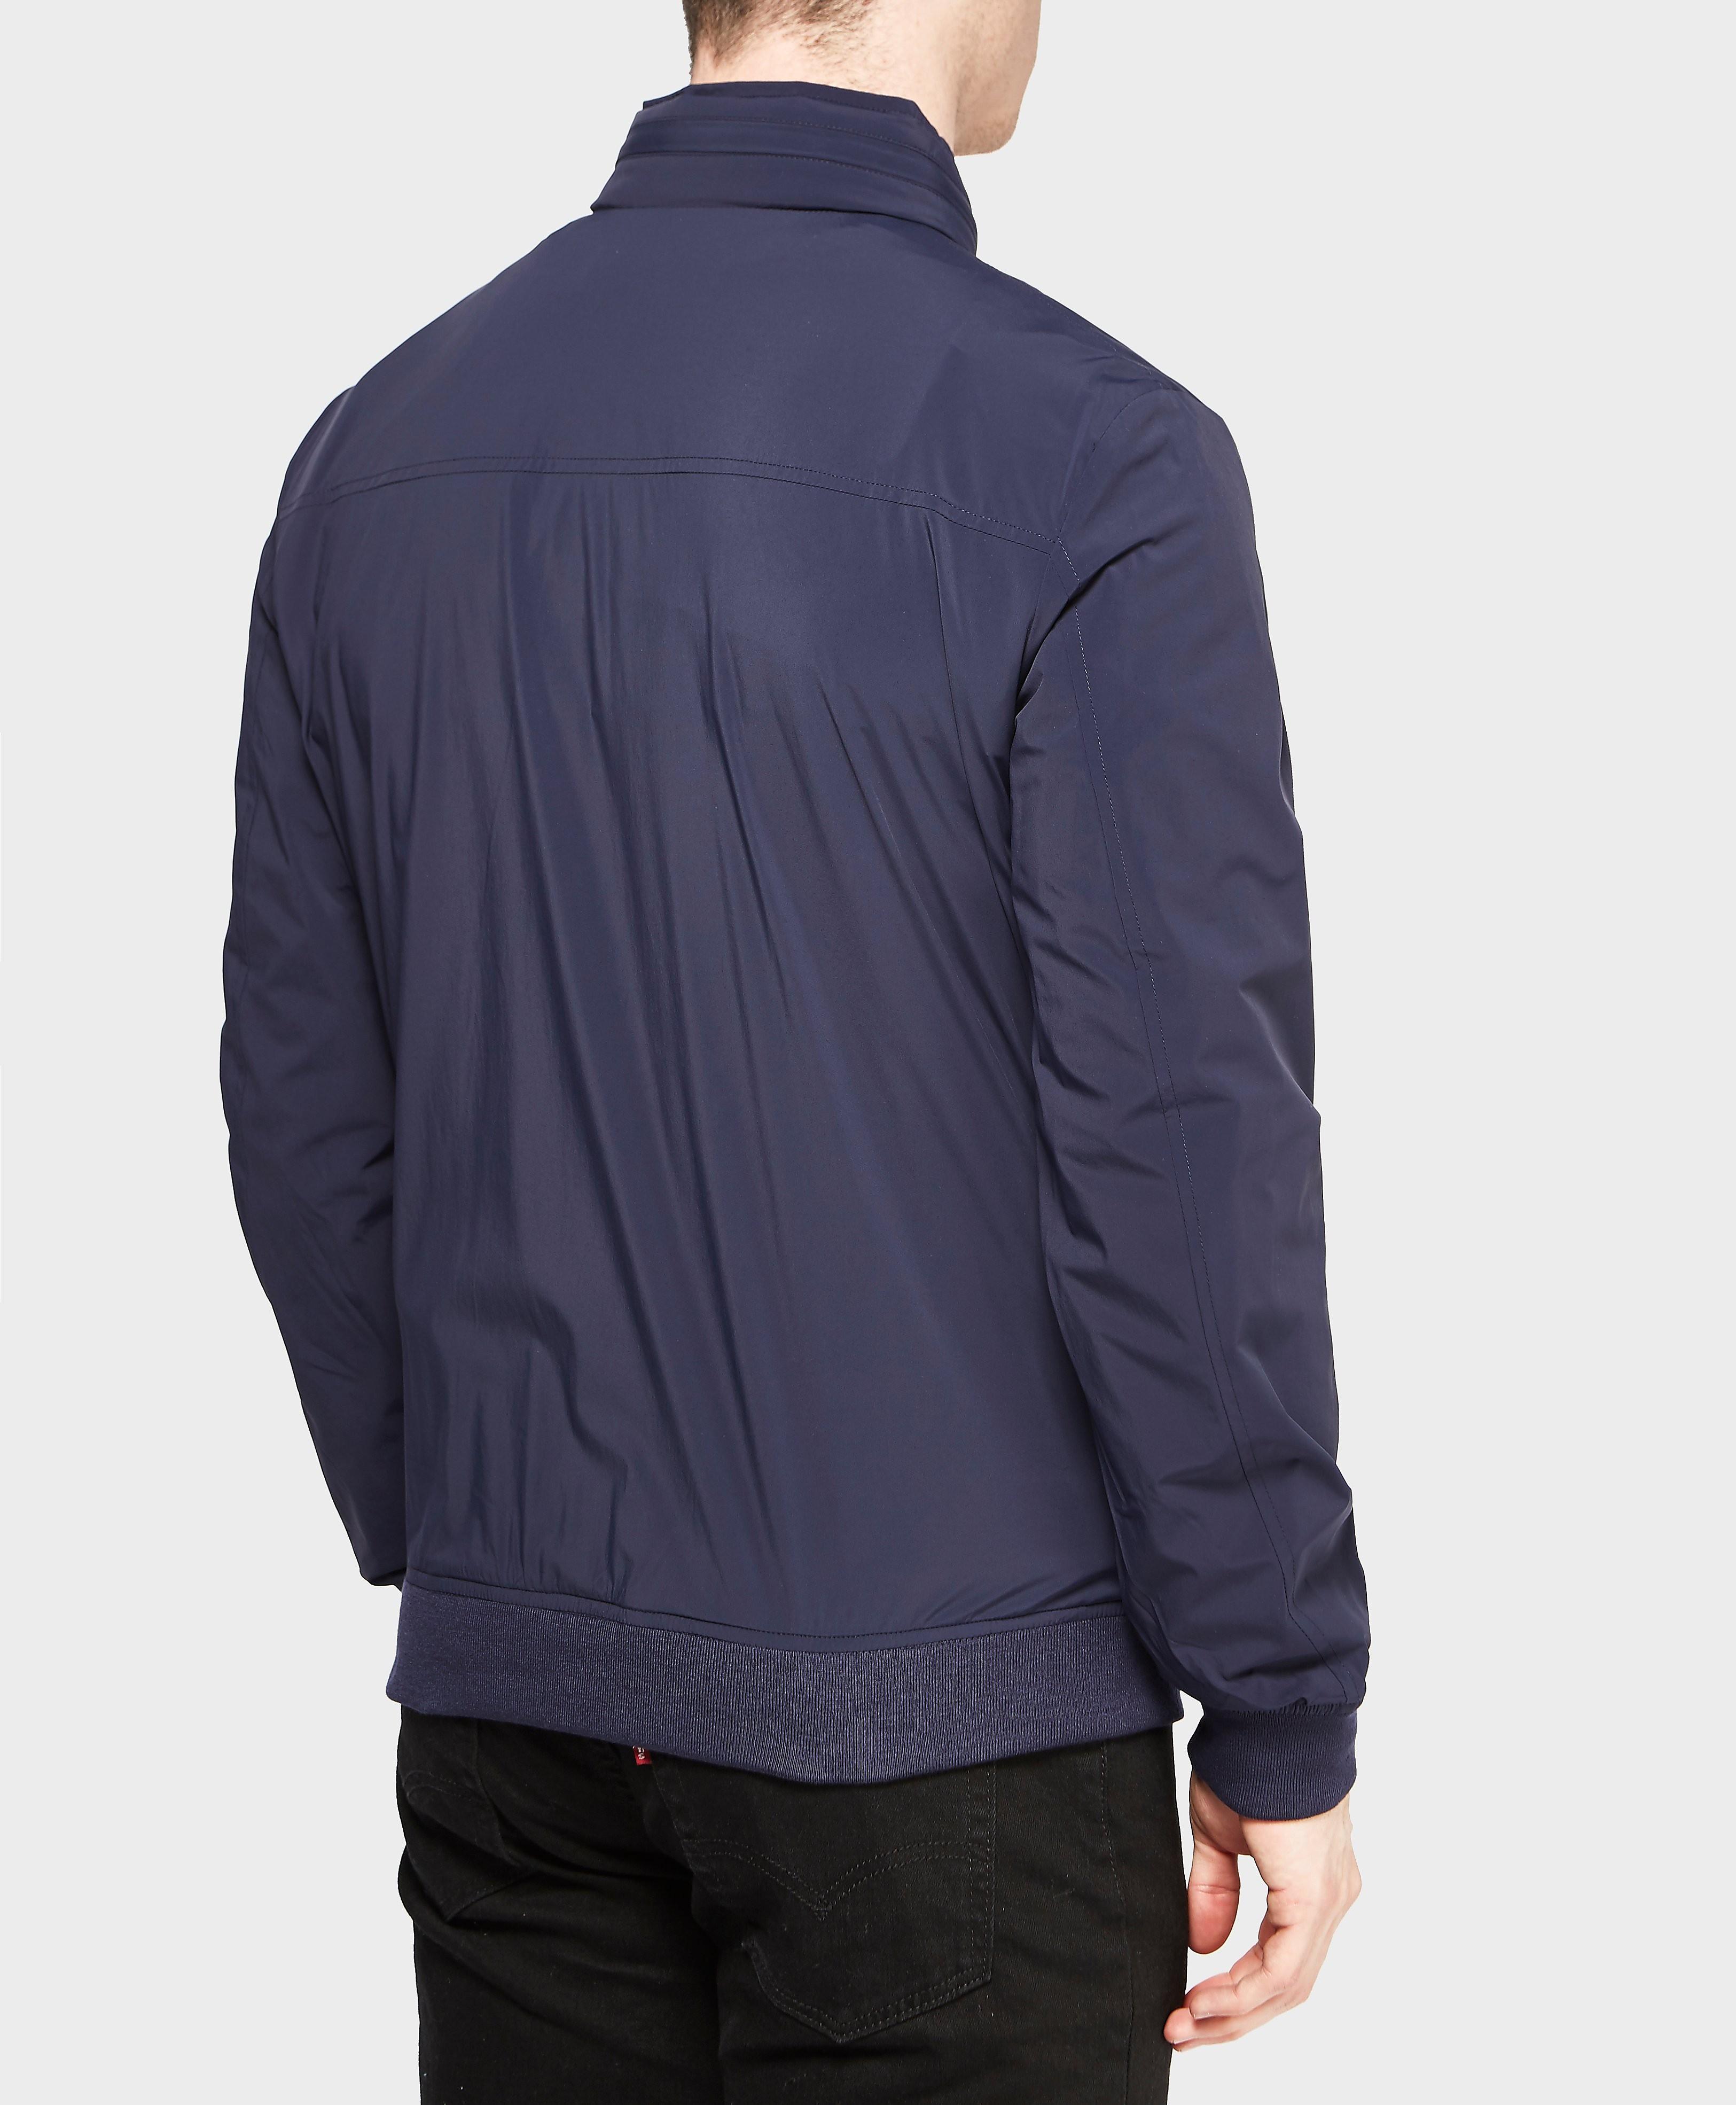 Aquascutum Light Bomber Jacket